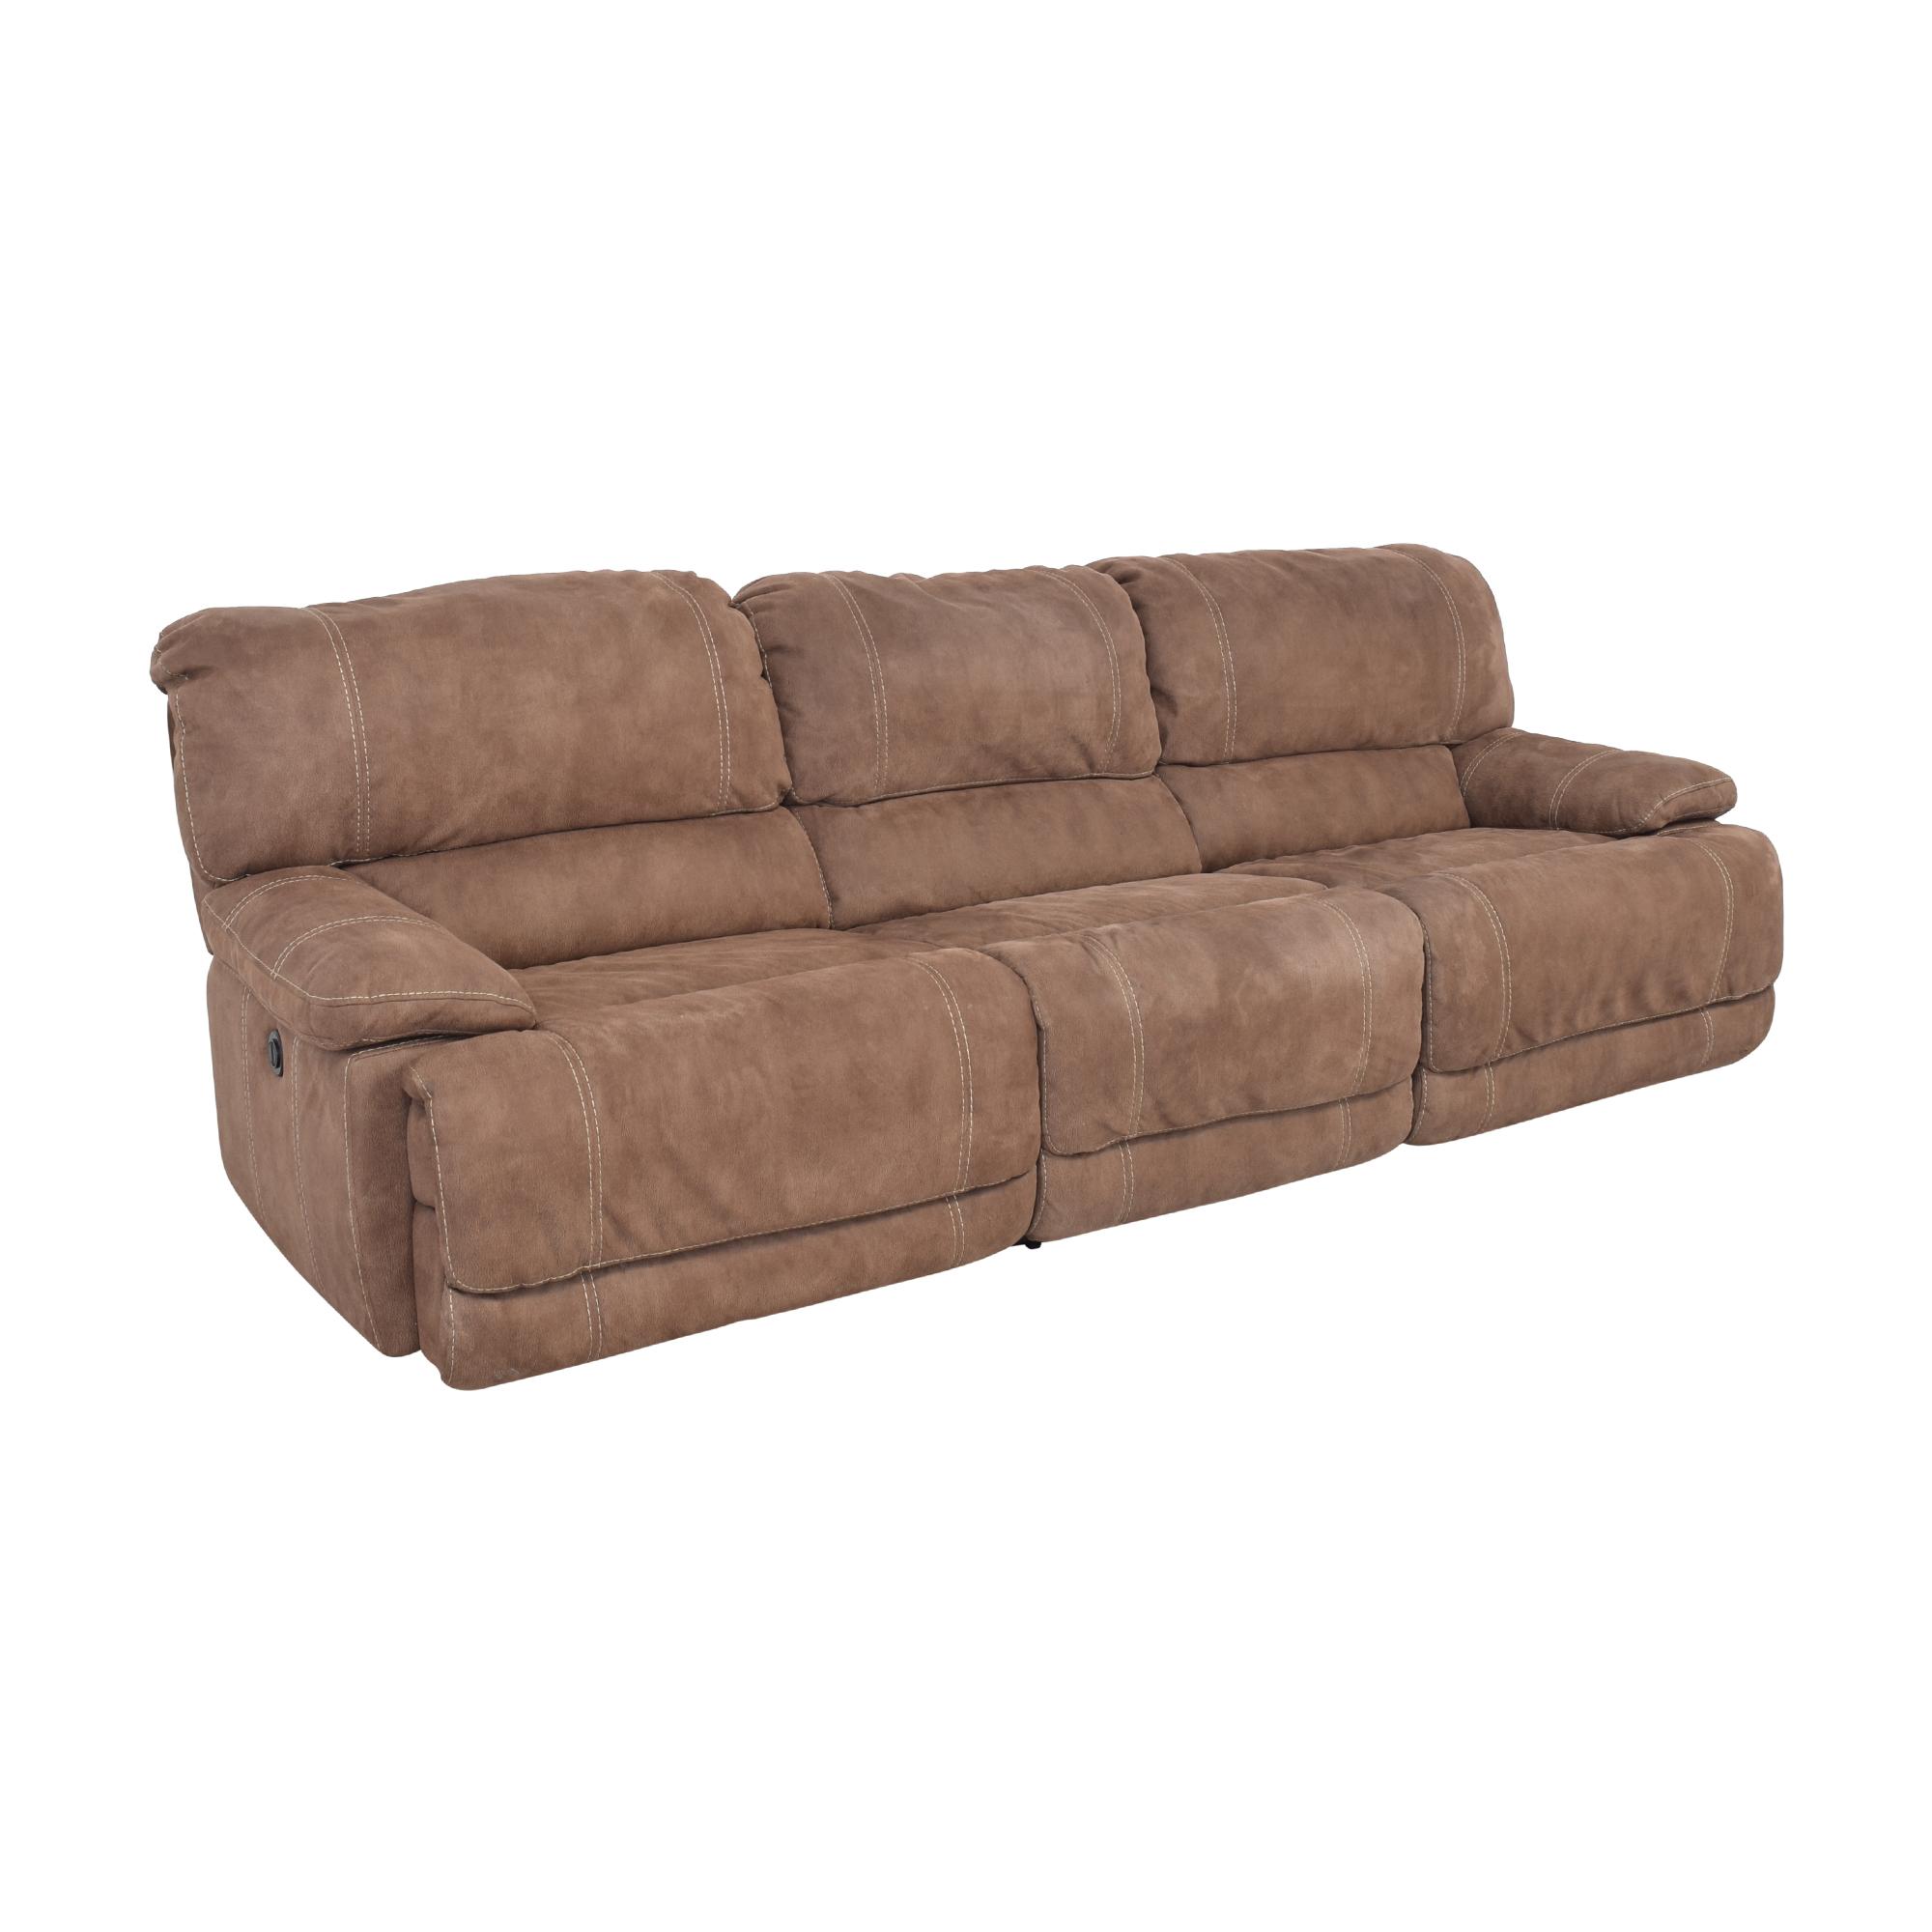 shop Macy's Macy's Three Cushion Reclining Sofa online